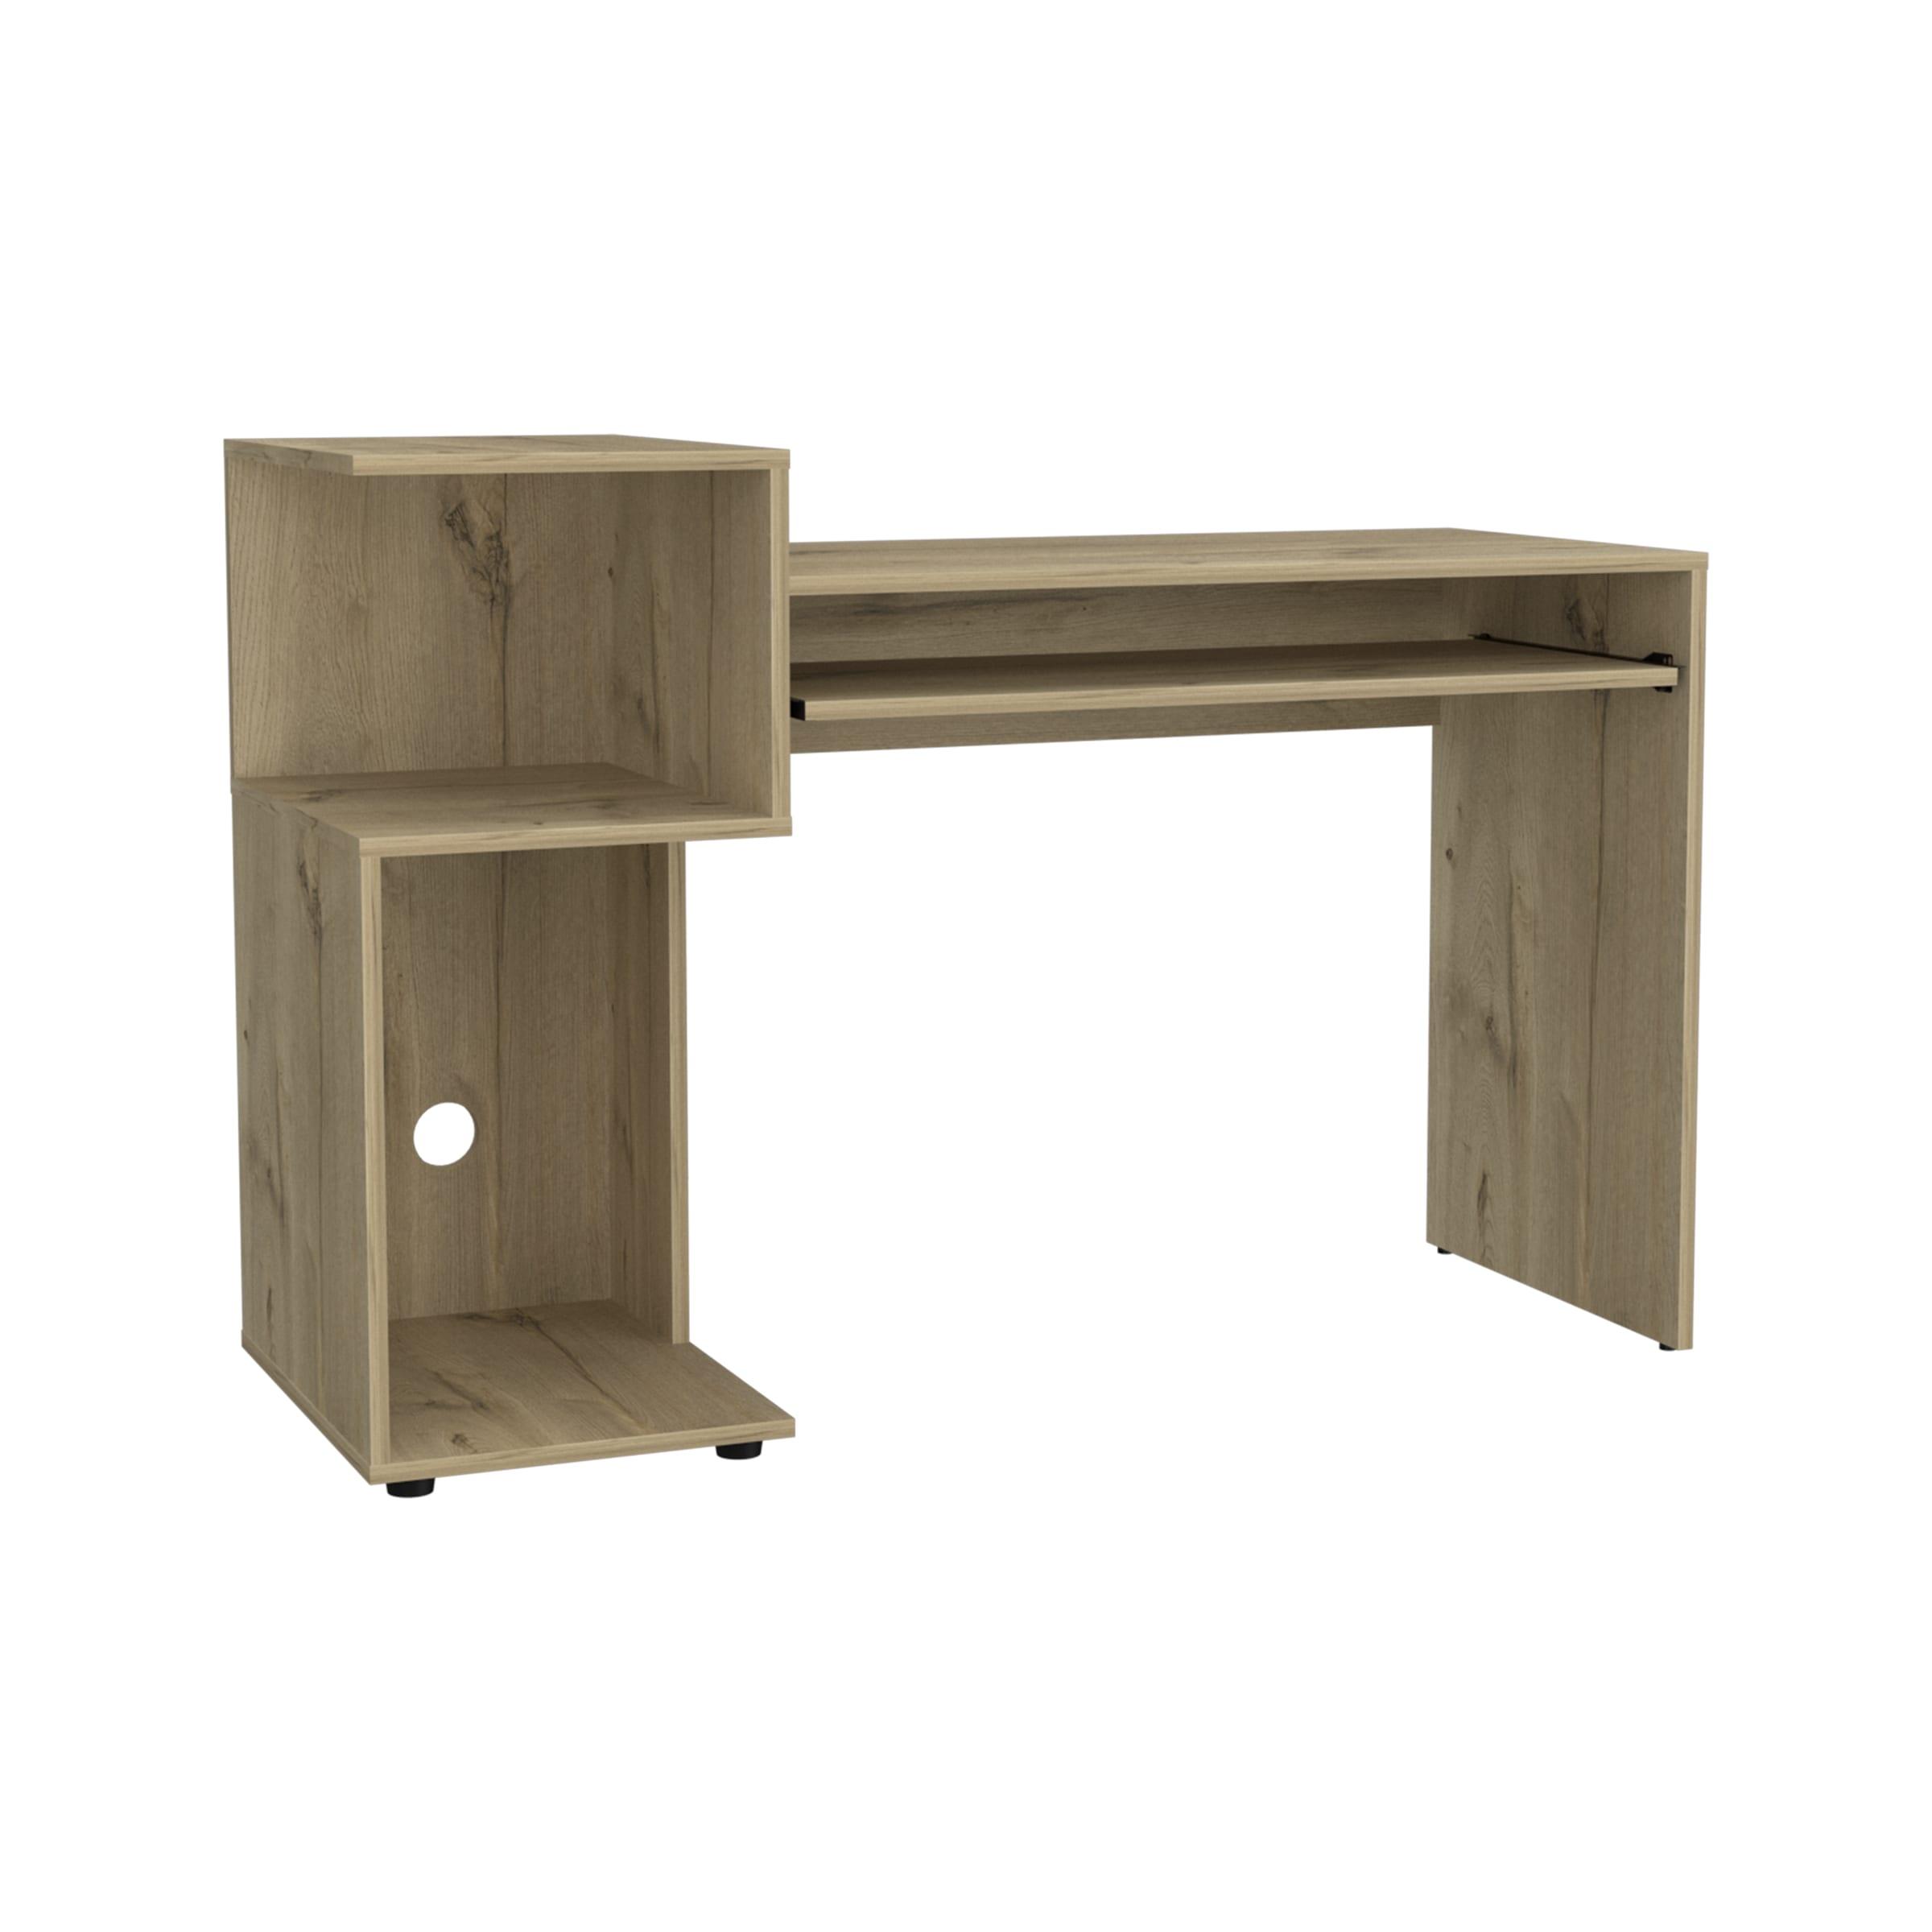 Brooks desk with low shelving unit (left side)